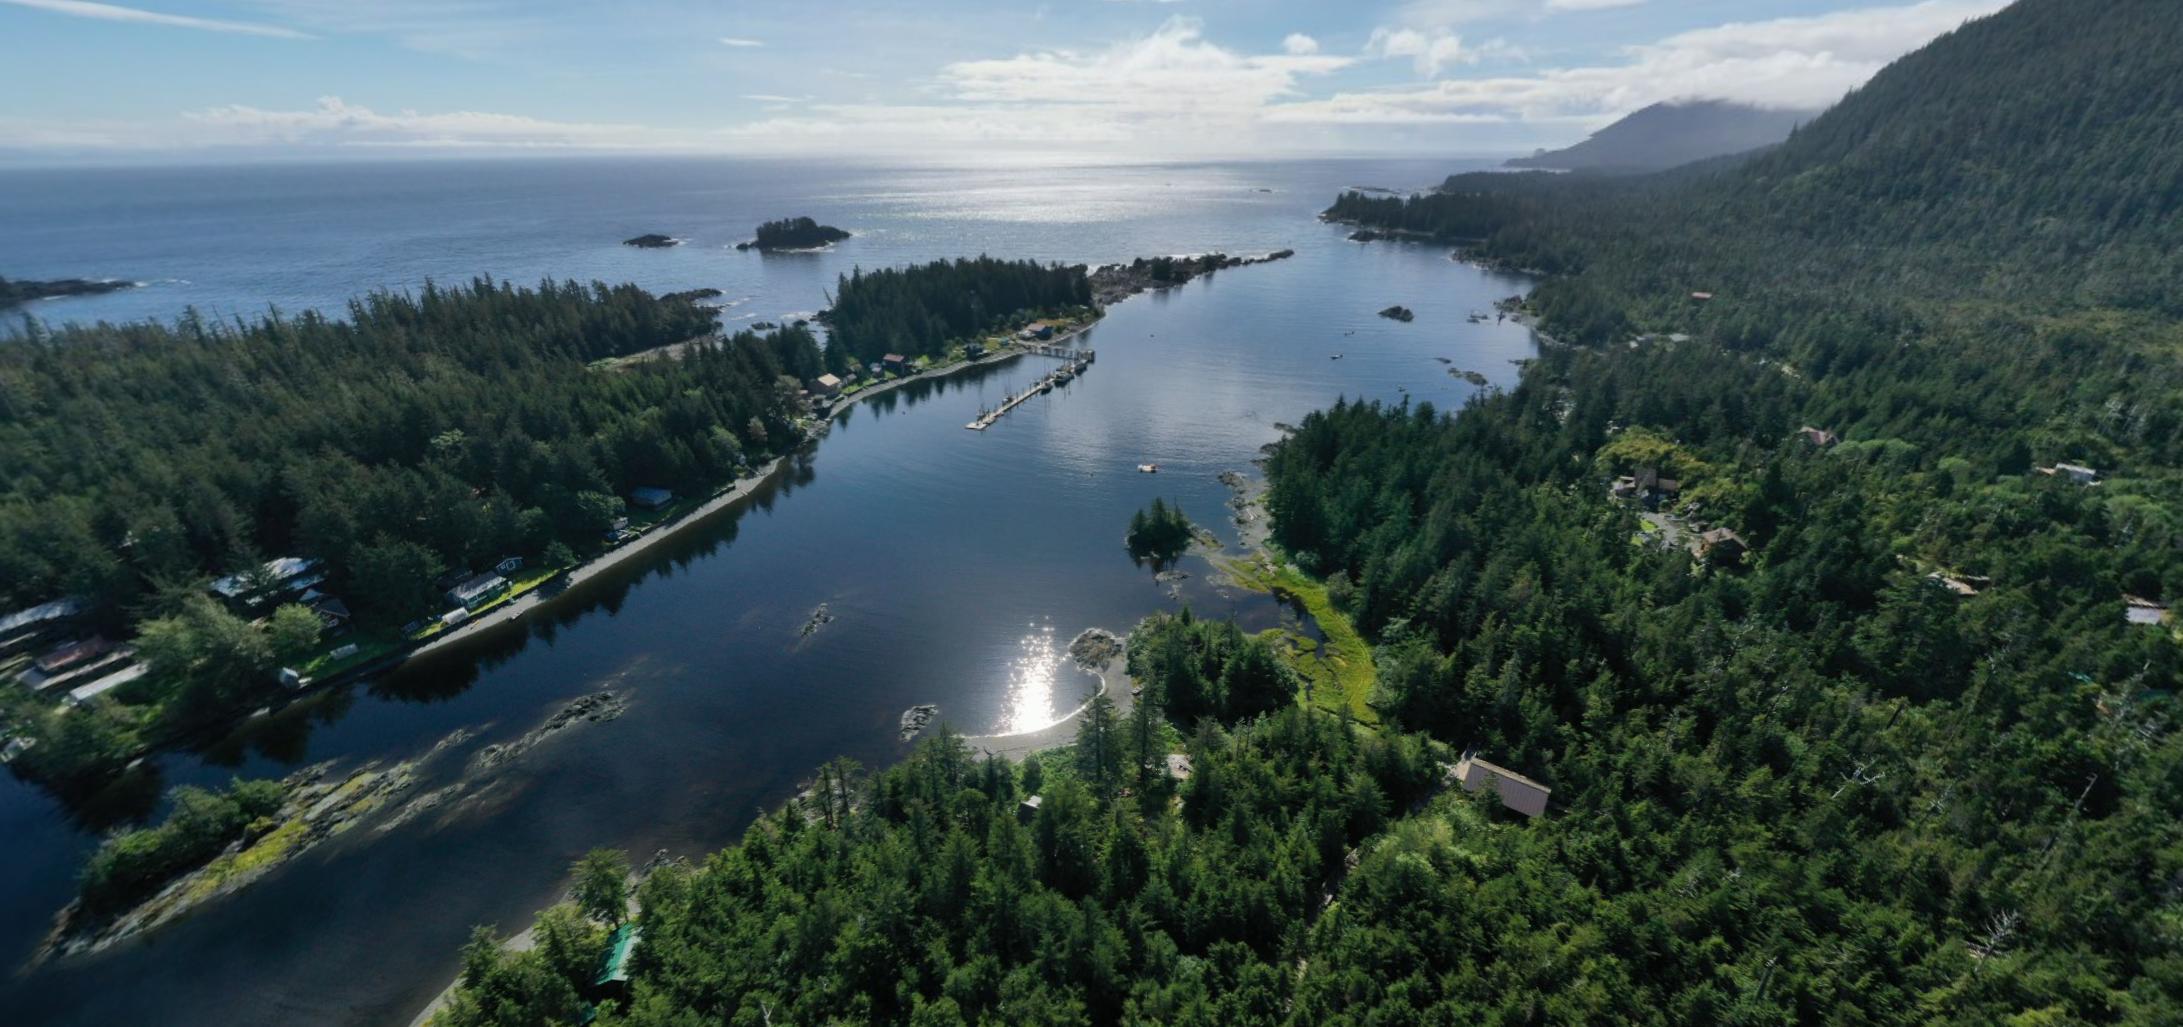 Port Alexander Drone Picture